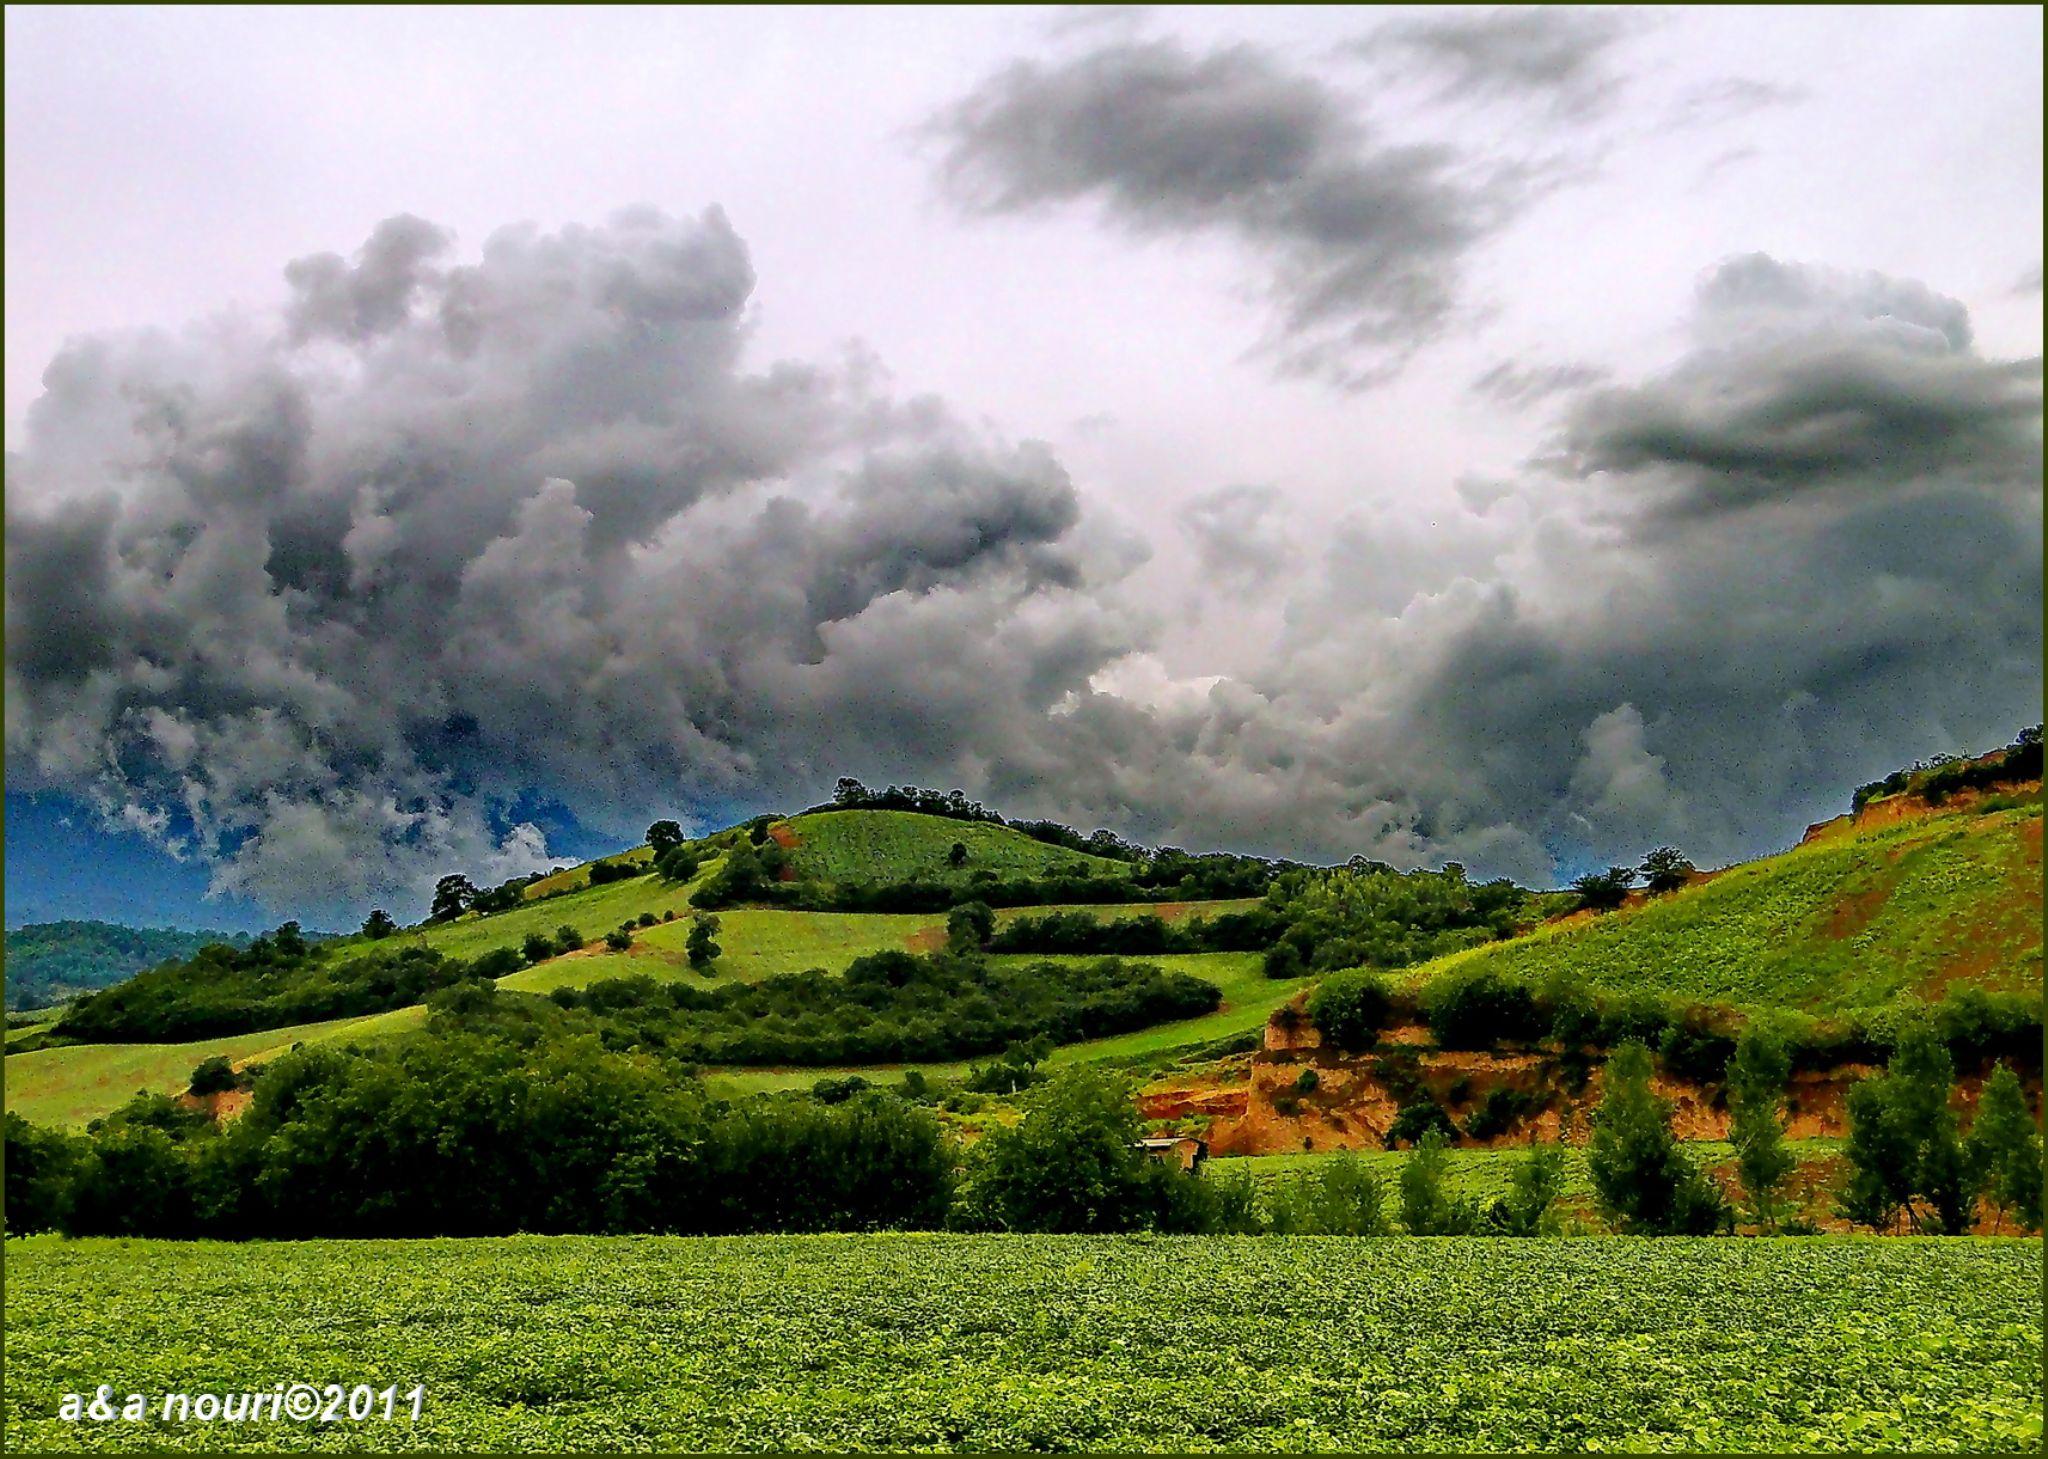 Gorgan's nature by Akbar Nouri